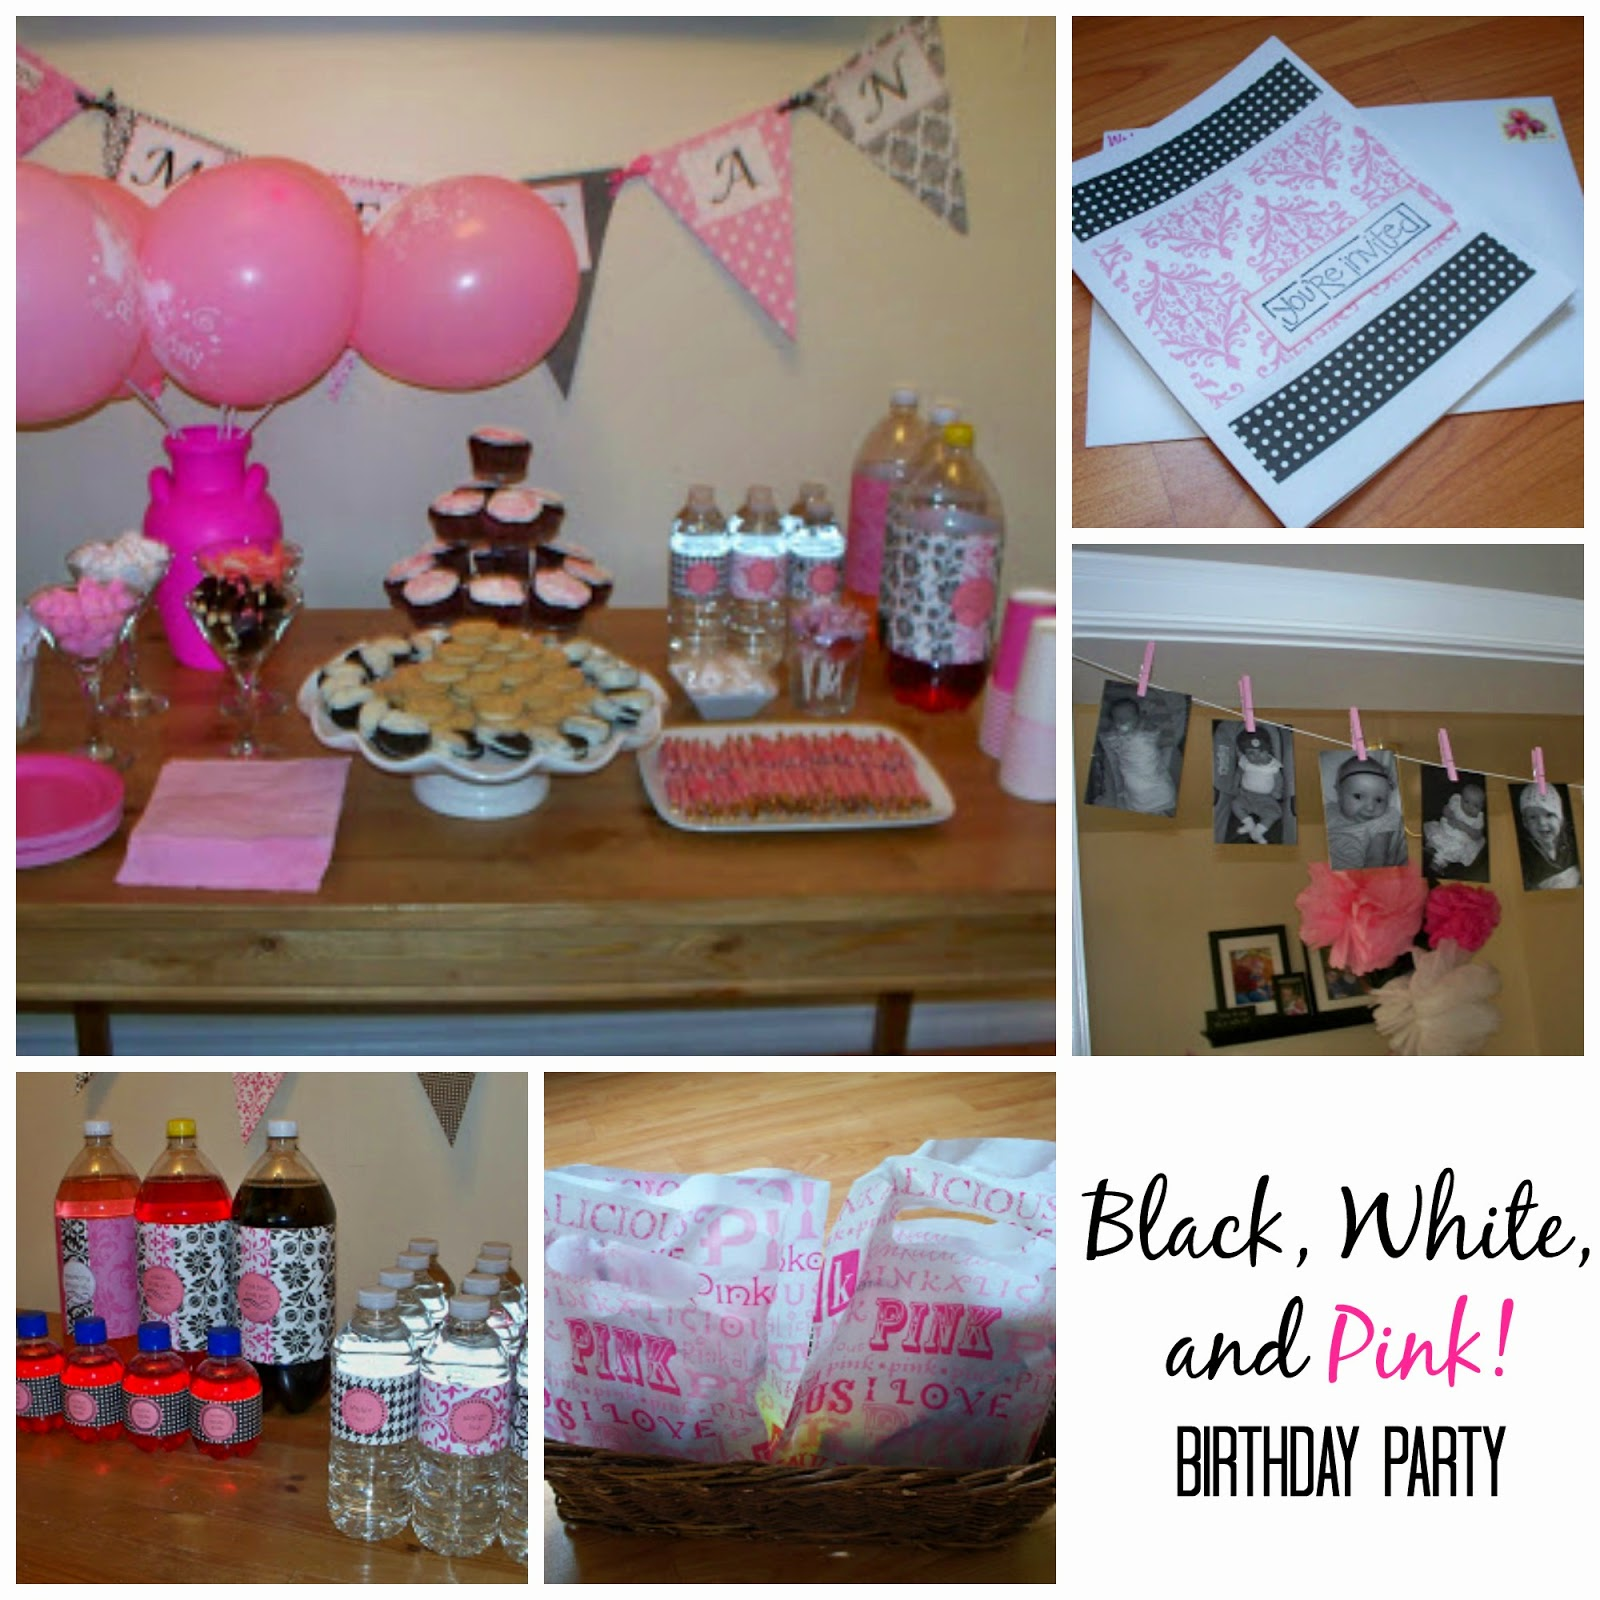 http://craftingandcreativity.blogspot.ca/2011/05/girls-1st-birthday-party-black-white.html